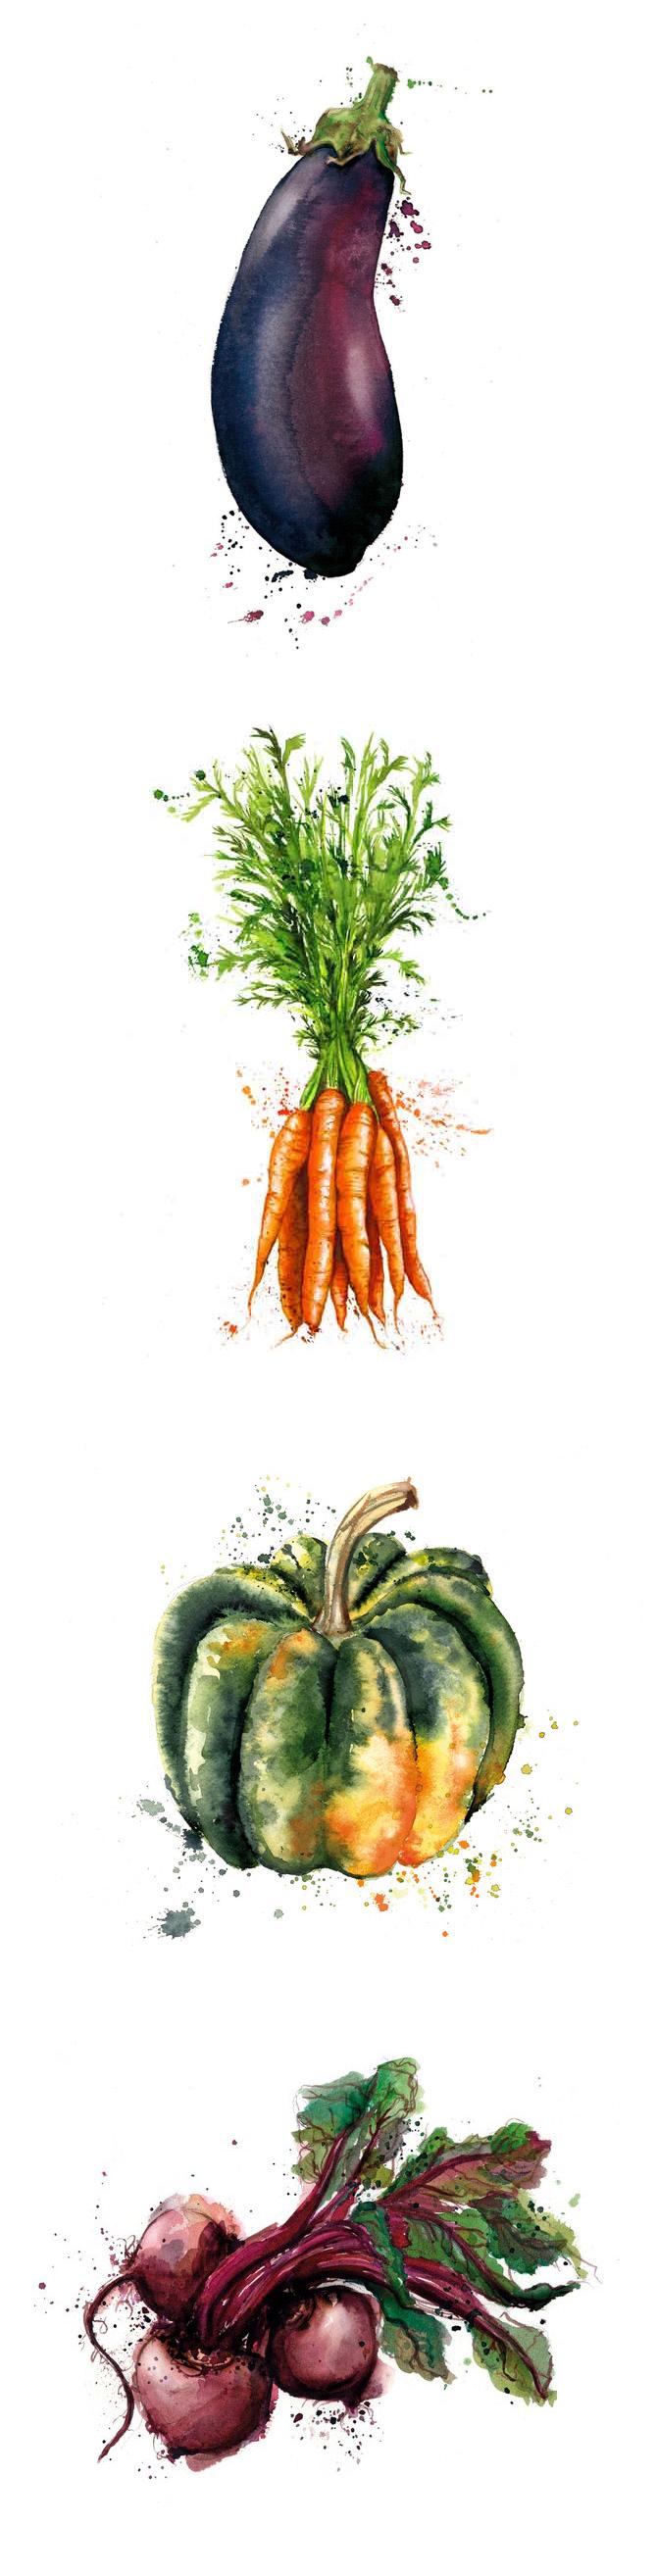 Drawn vegetable Vegetables Georgina illustrazione by illustration